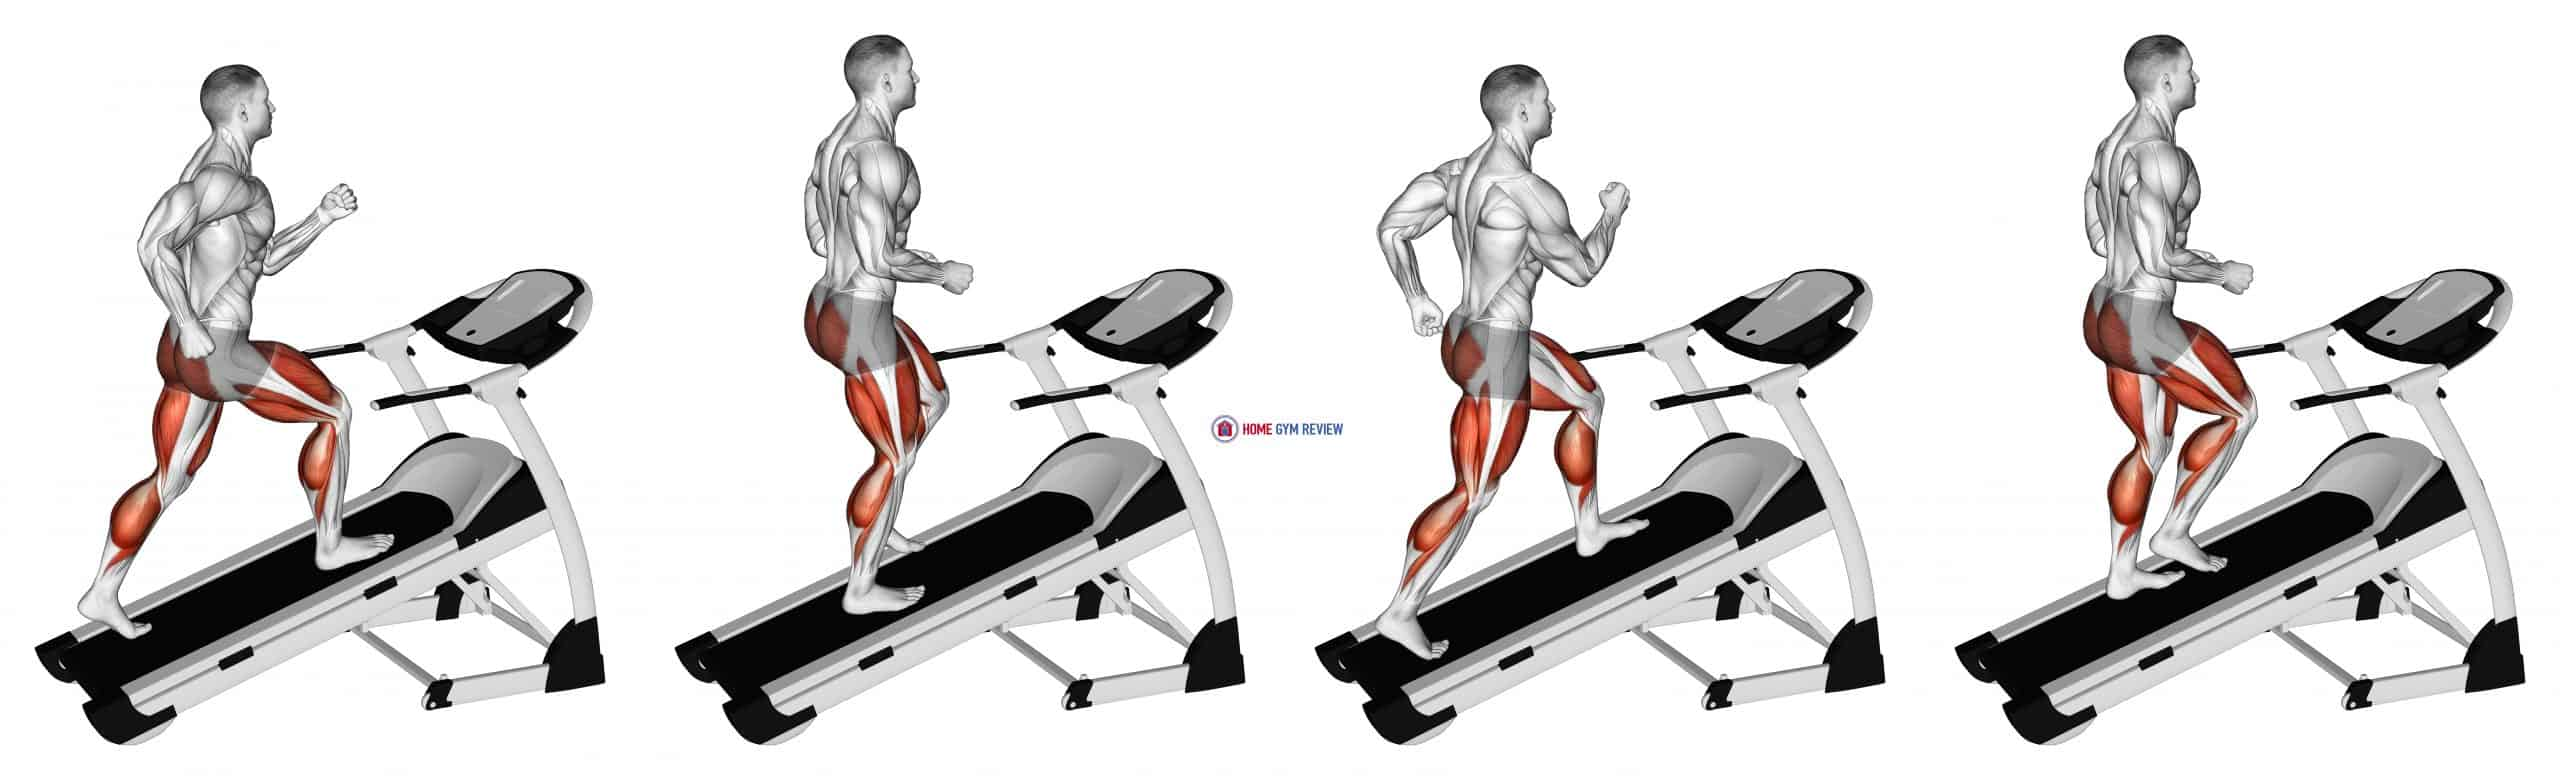 Walking on Incline Treadmill